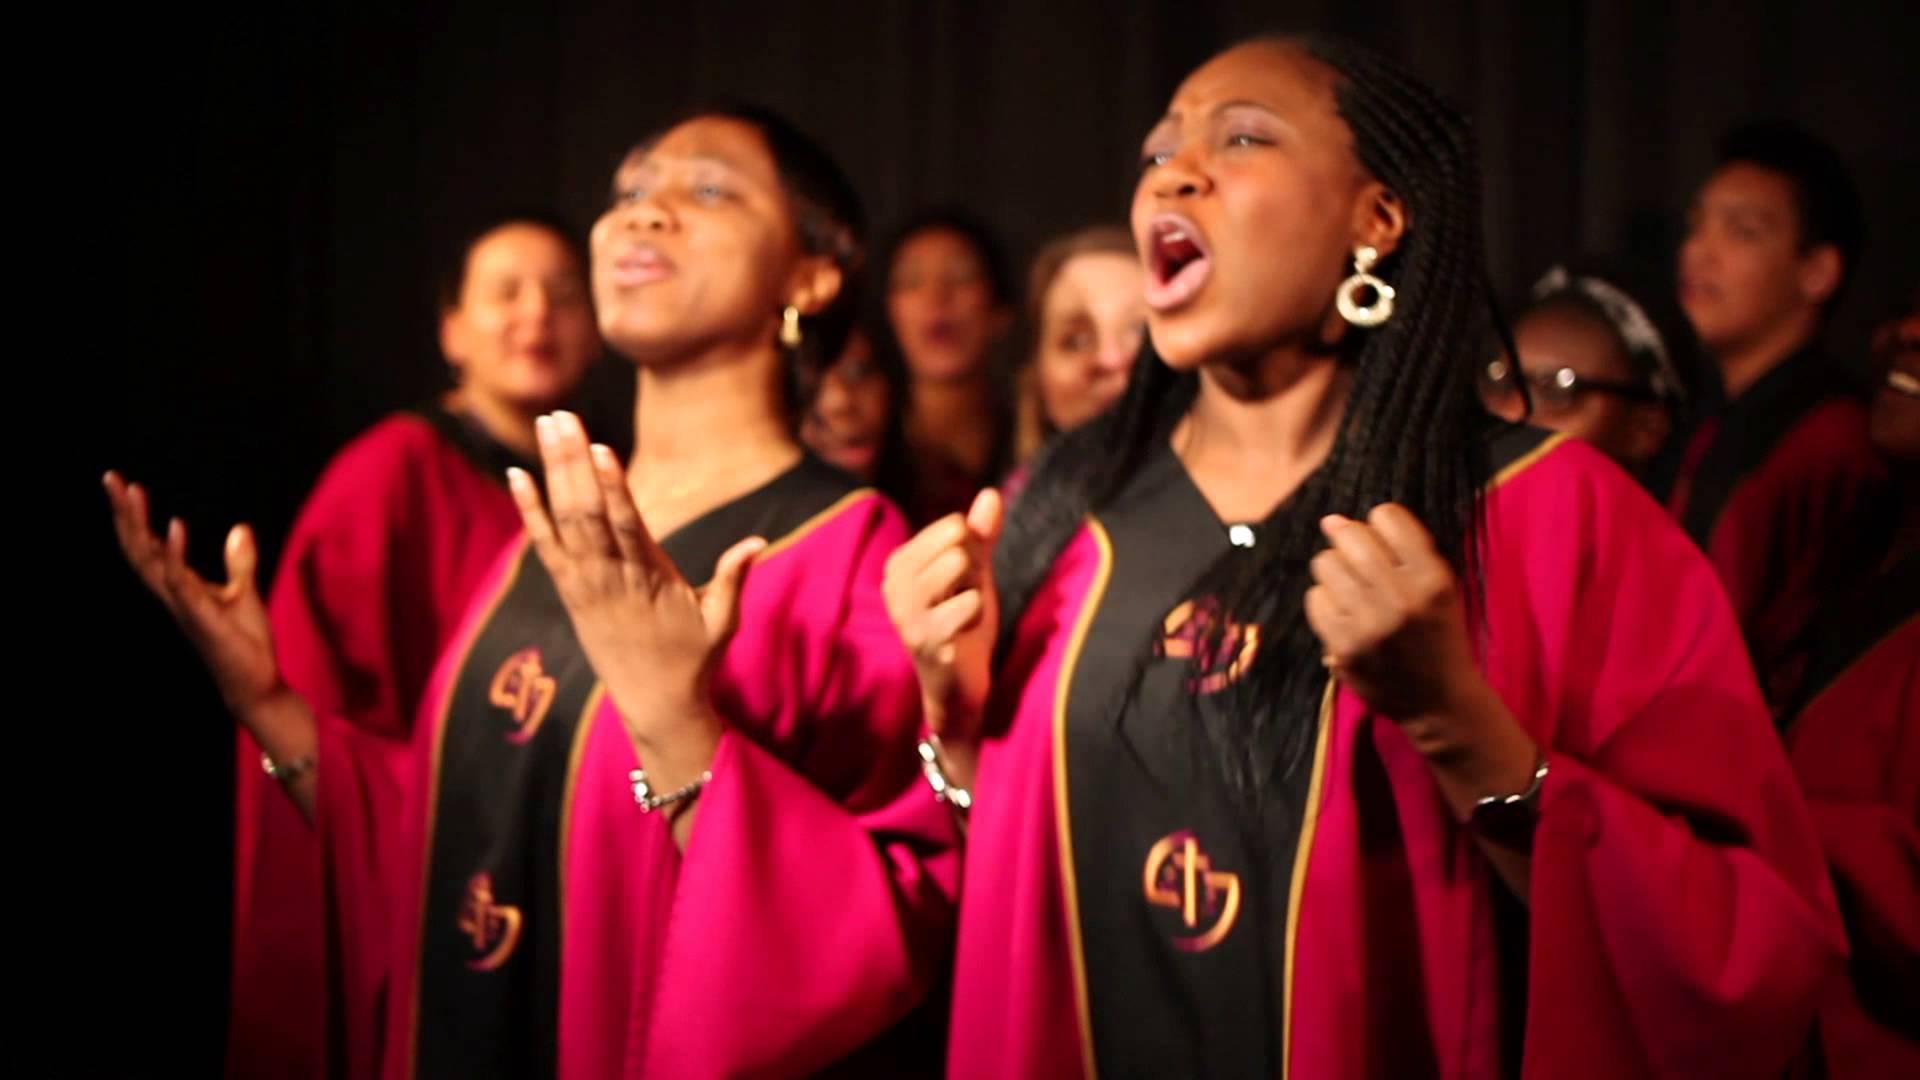 8 Must Hear Gospel Songs | Freeccm.com